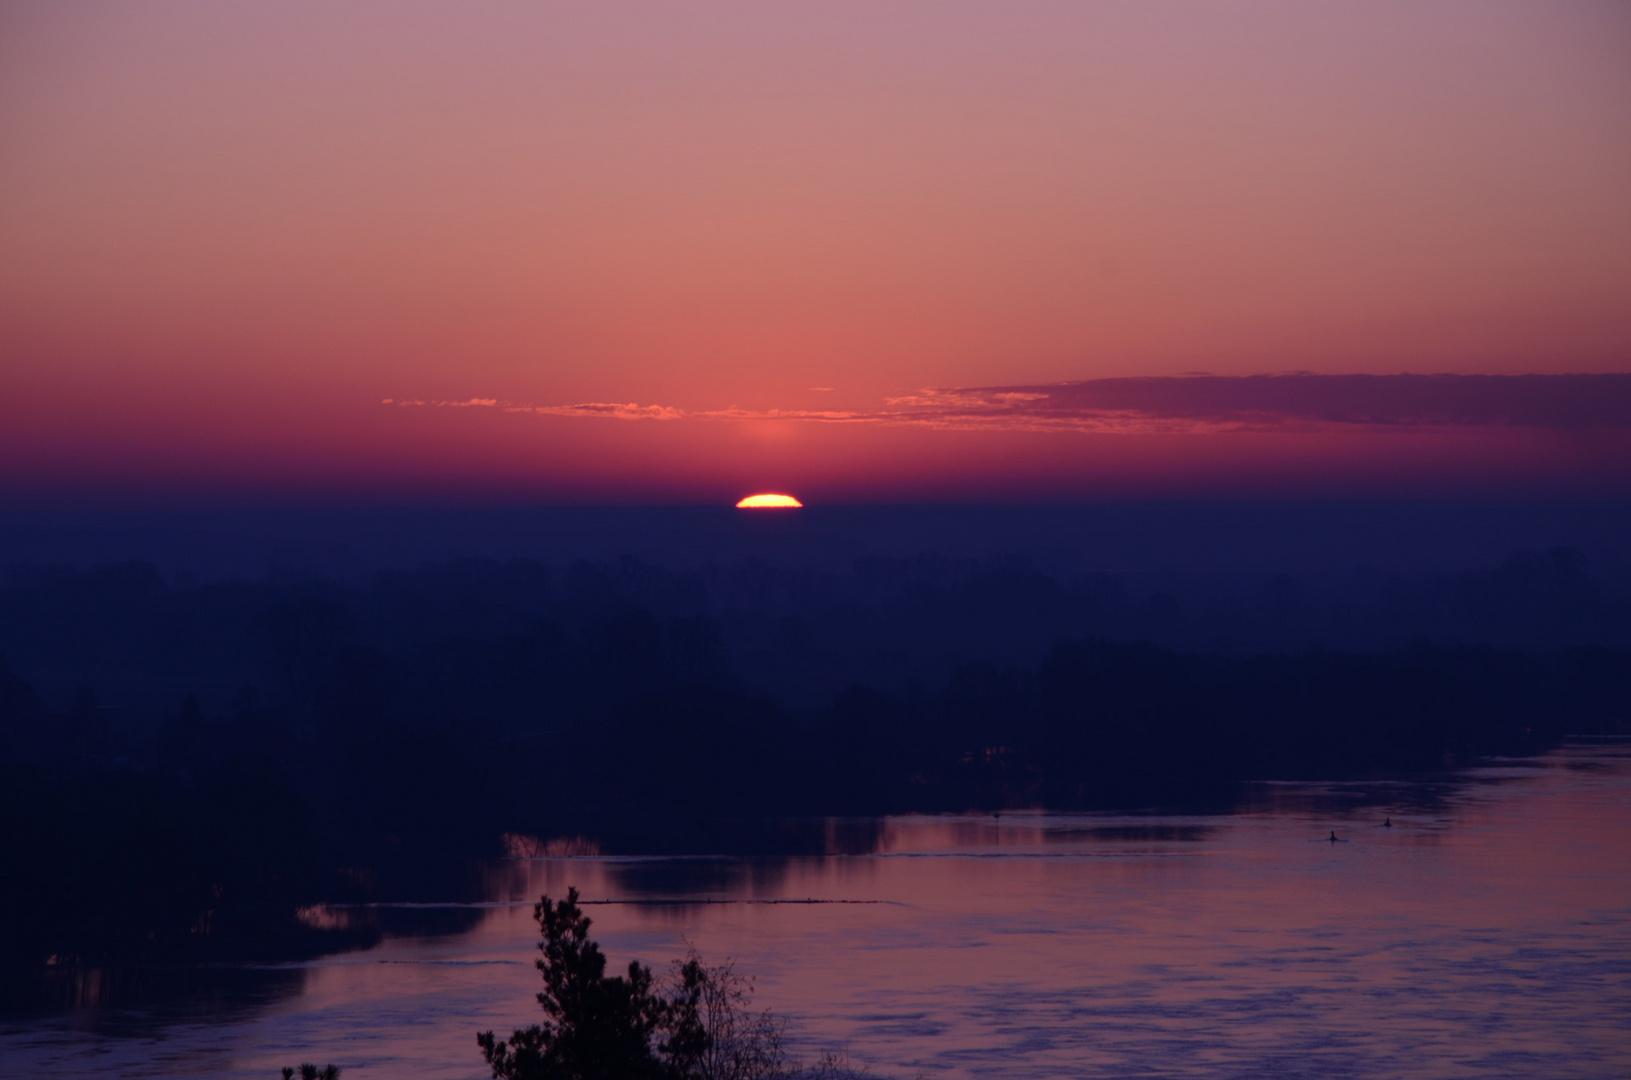 Sonnenaufgang 2 - Ostersonntag 08.04.2012